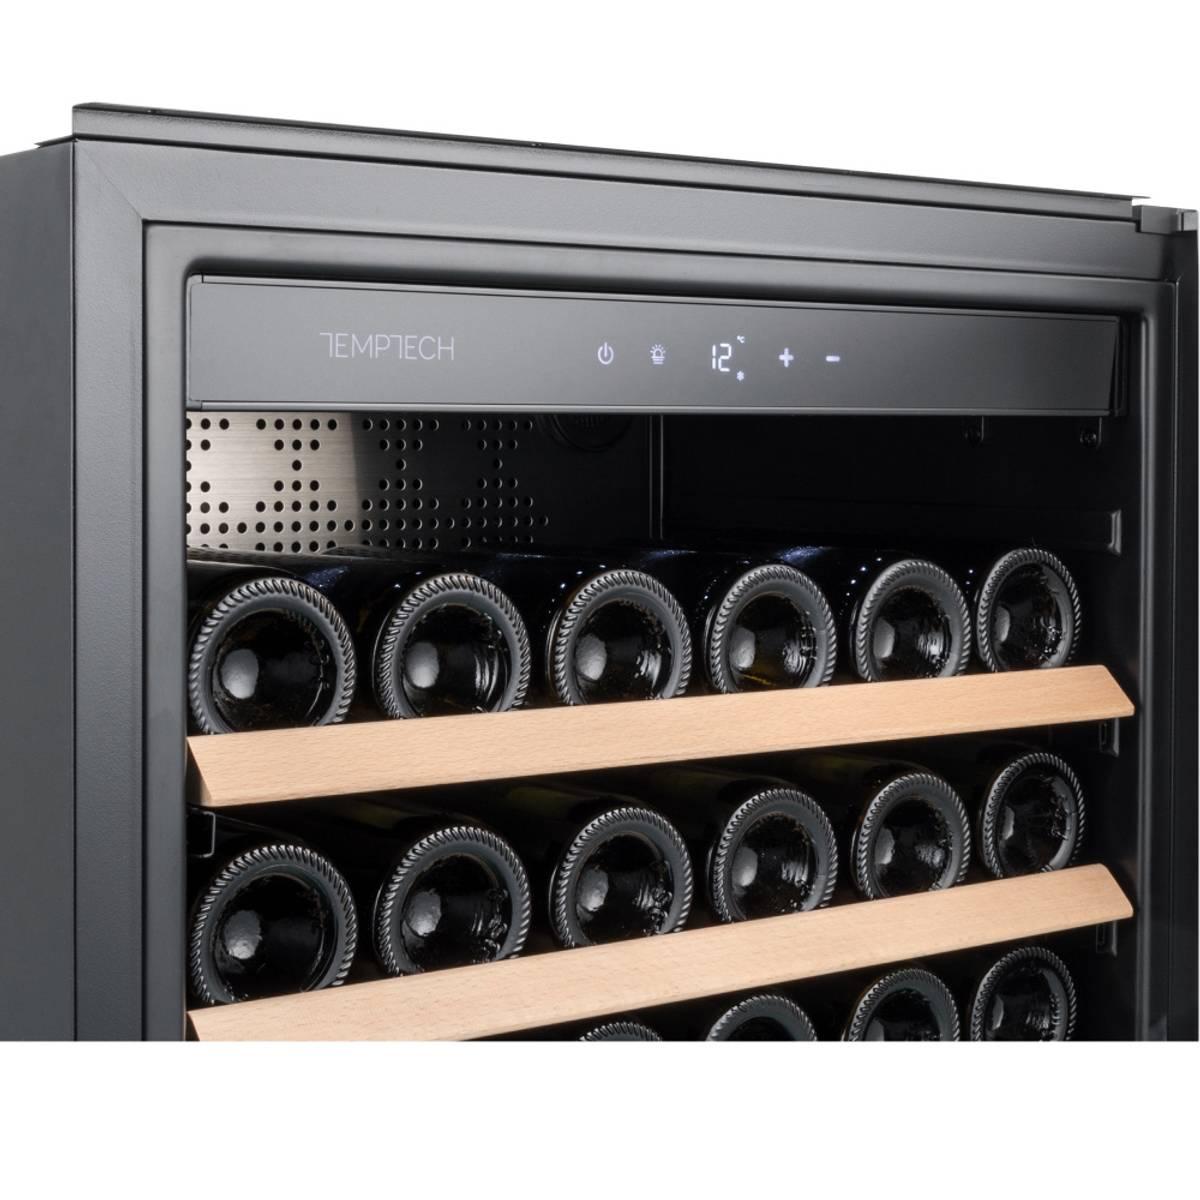 Temptech Oslo vinskap, 1 sone, 18 flasker, høyskap